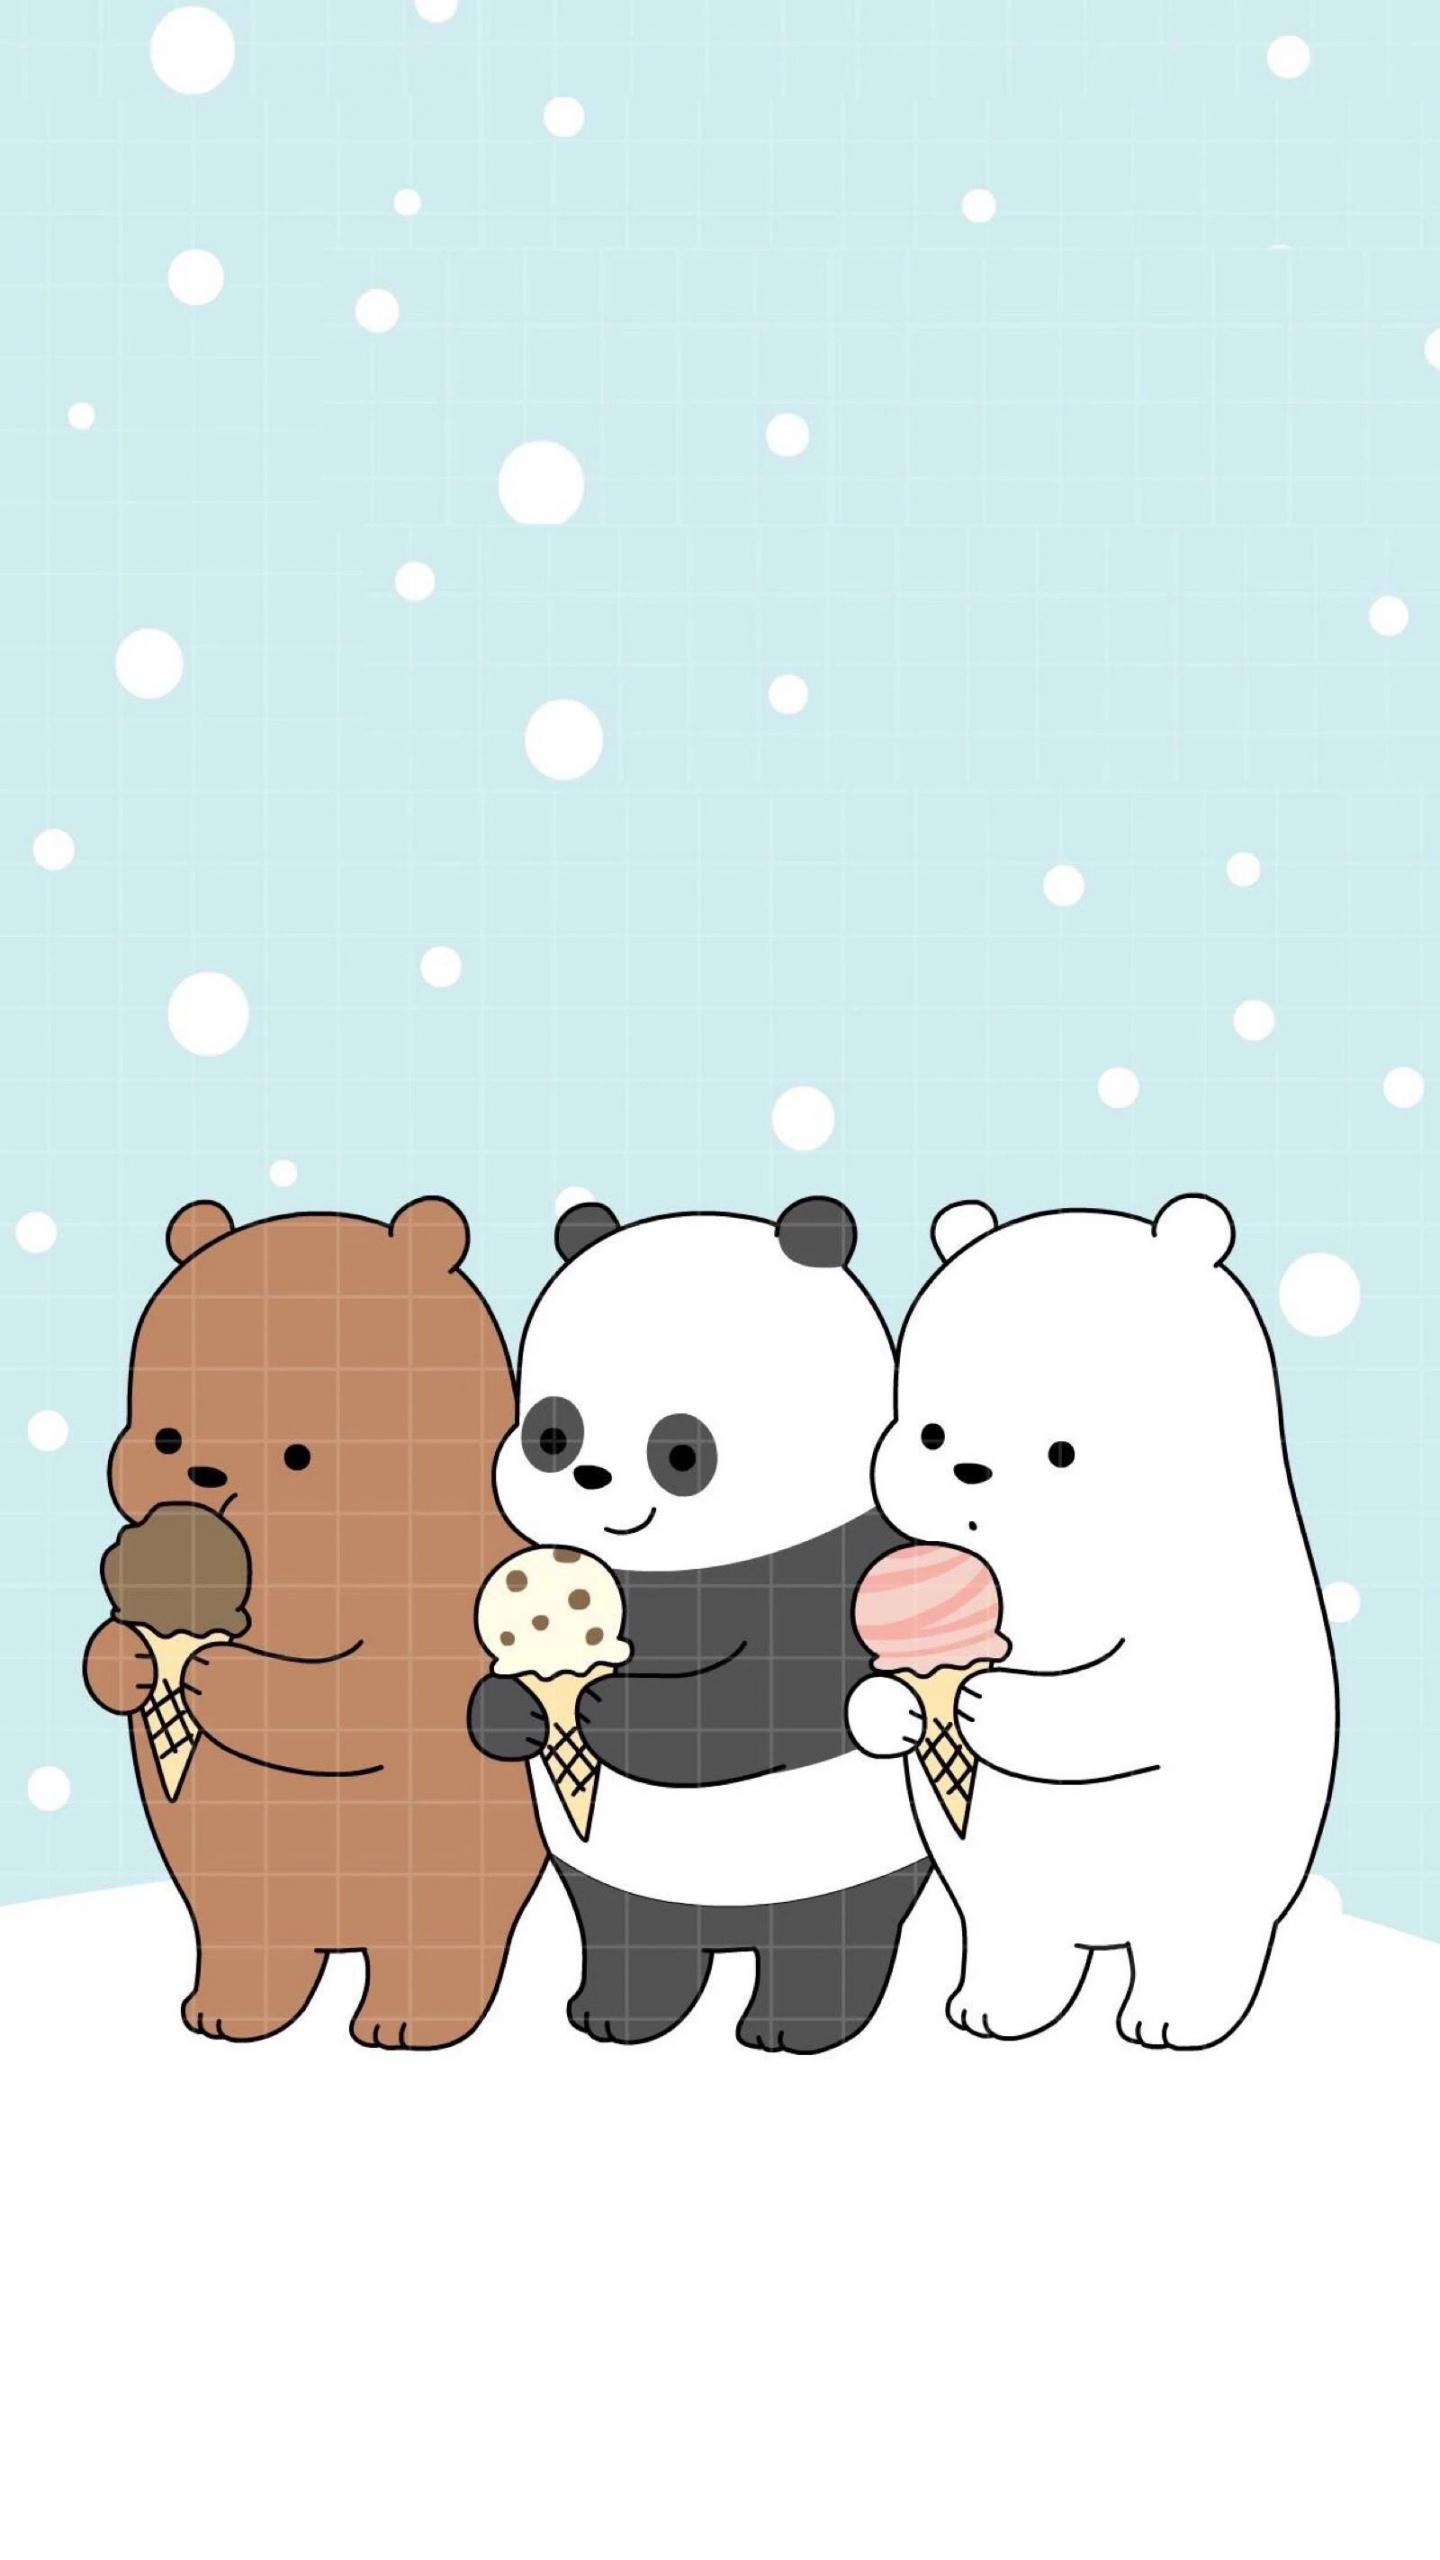 Free Download We Bare Bears Bear Wallpaper Pinterest We Bare Bears